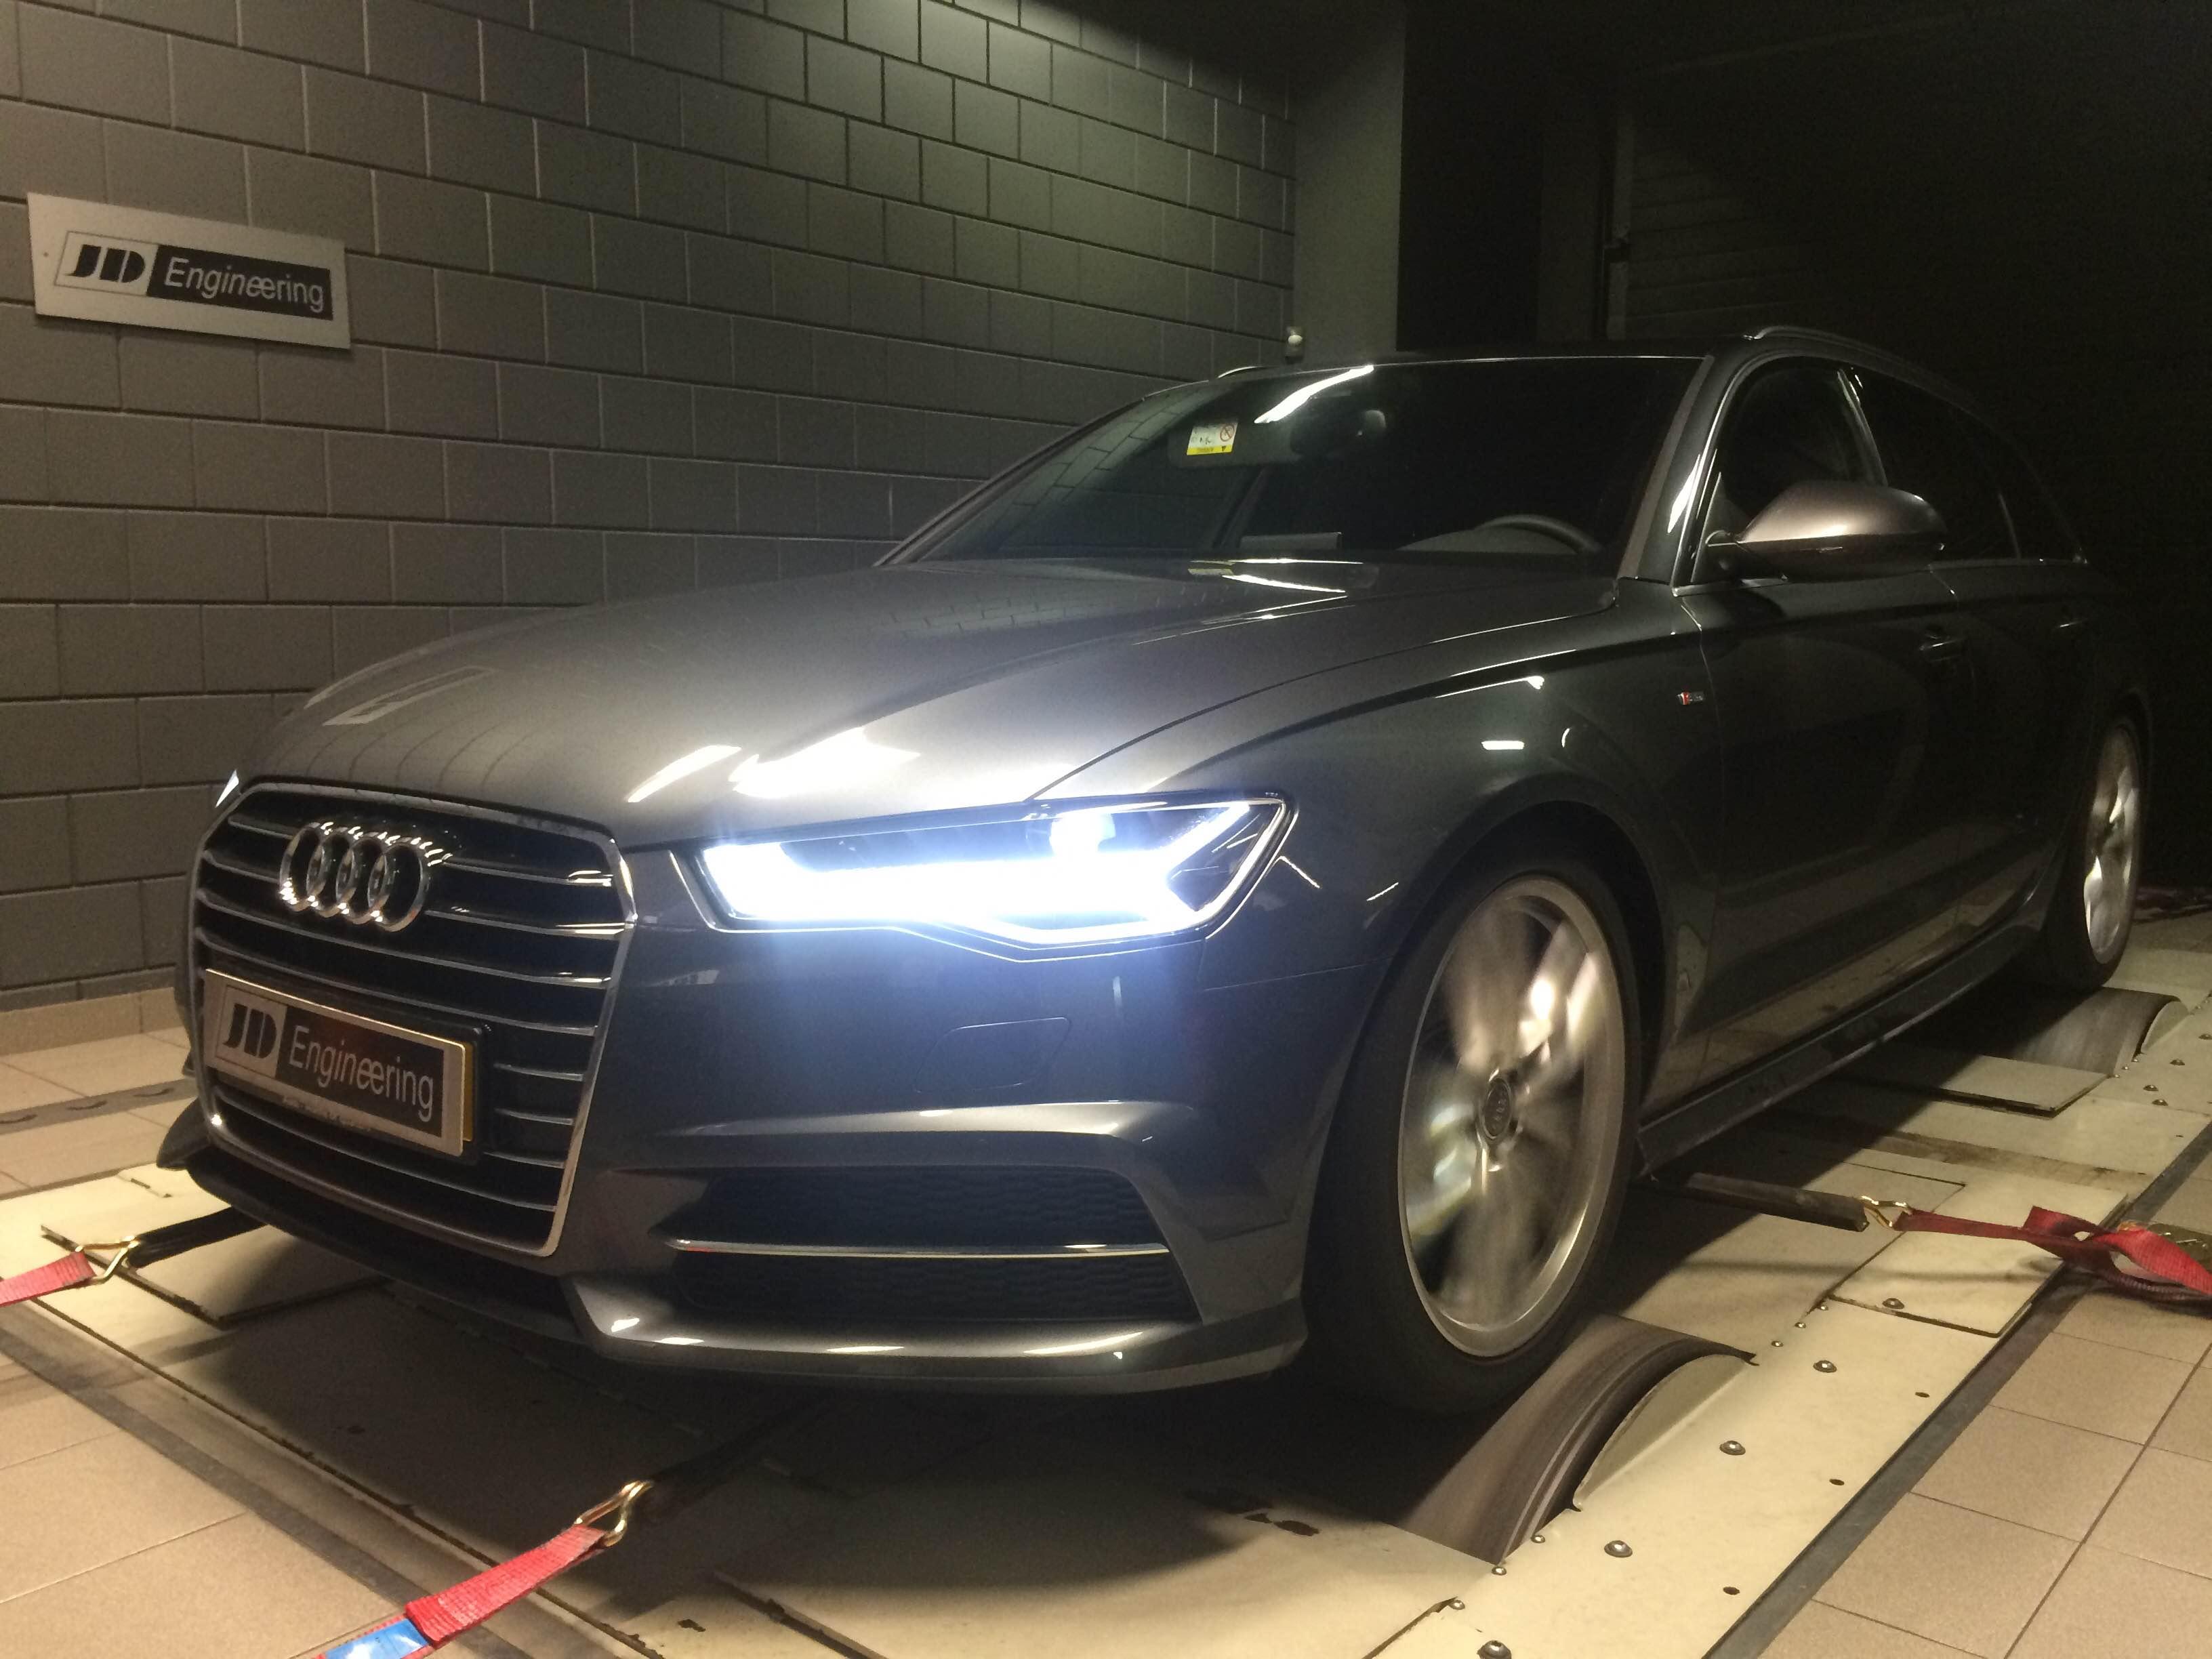 Audi Ultra 2.0 TDI 190pk JDEngineering